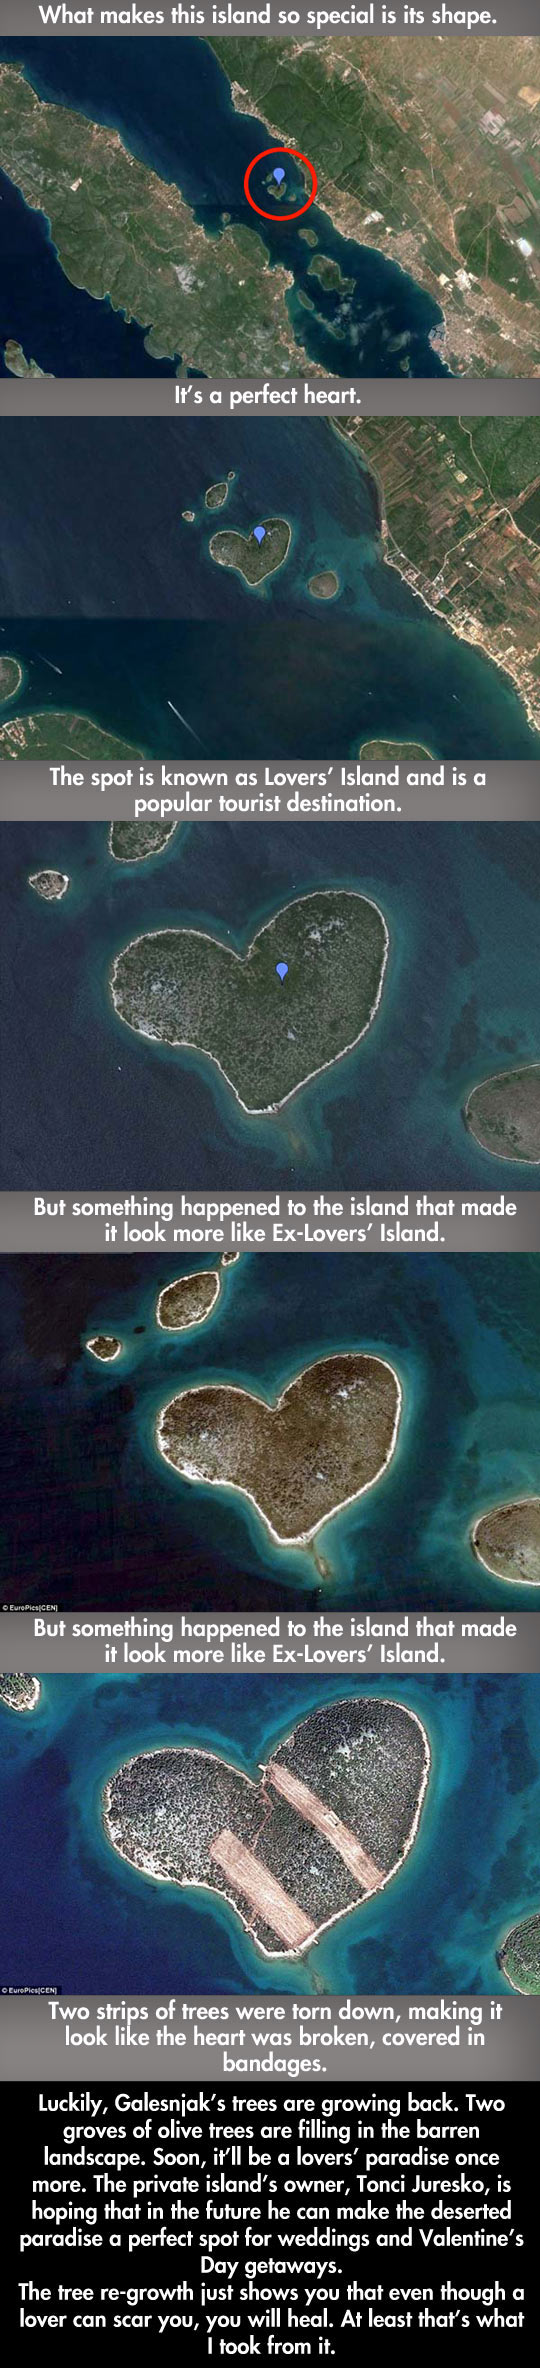 funny-Google-earth-heart-sea-island-air-view